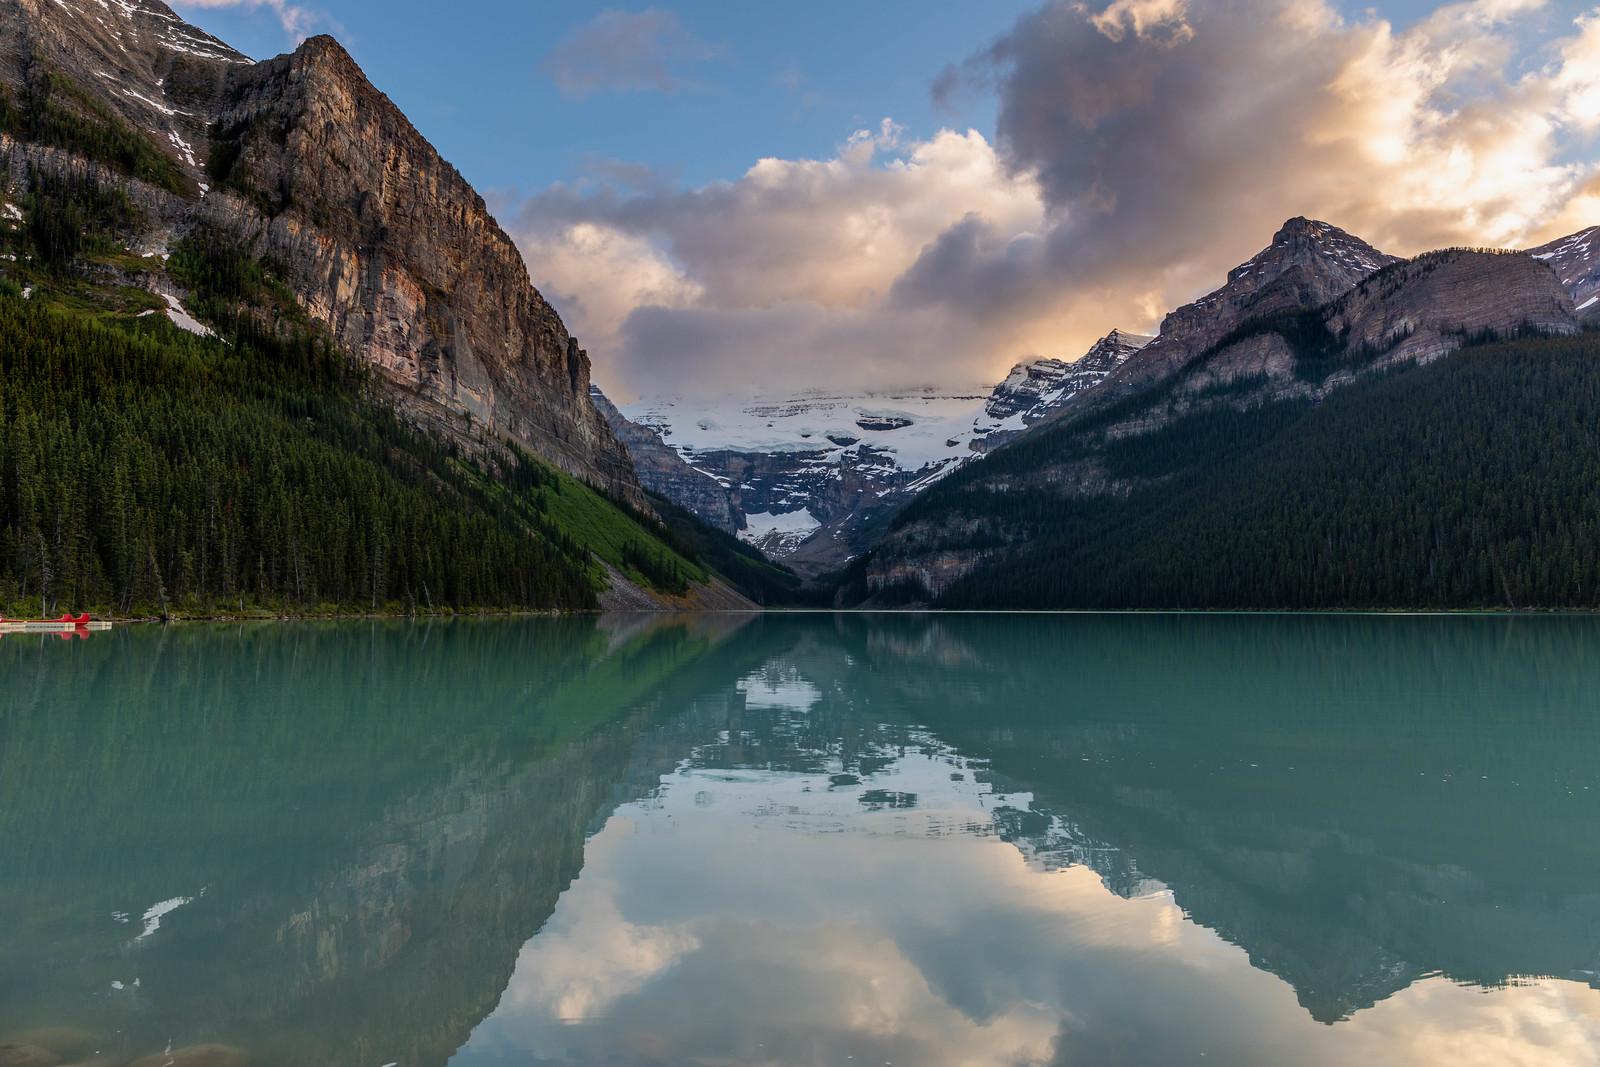 06.28. Lake Louise, Banff National Park, AB, Canada